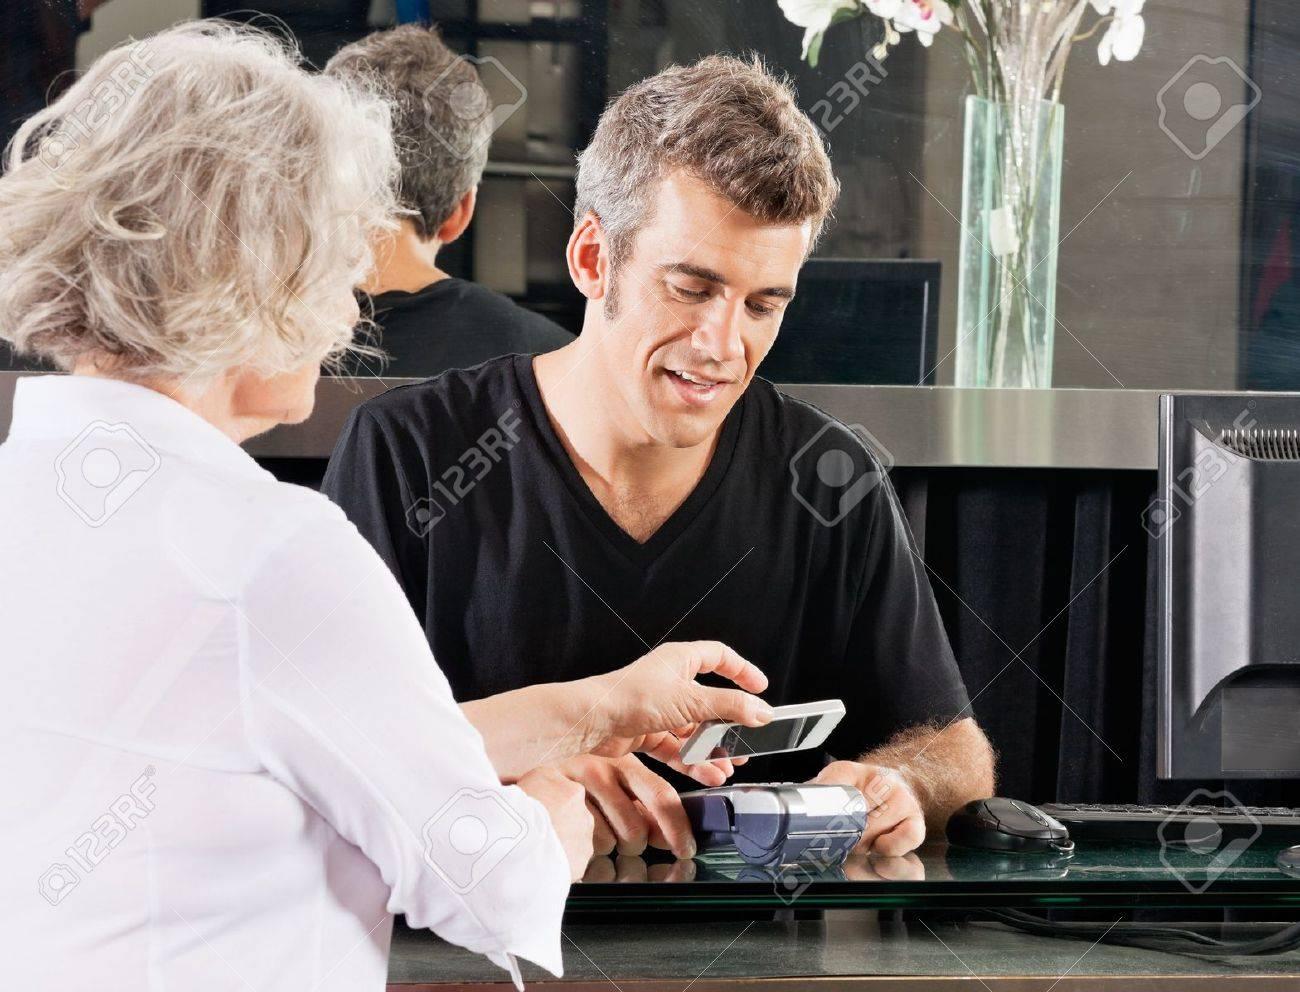 Customer Paying Through Mobile Phone At Salon Stock Photo - 18521621